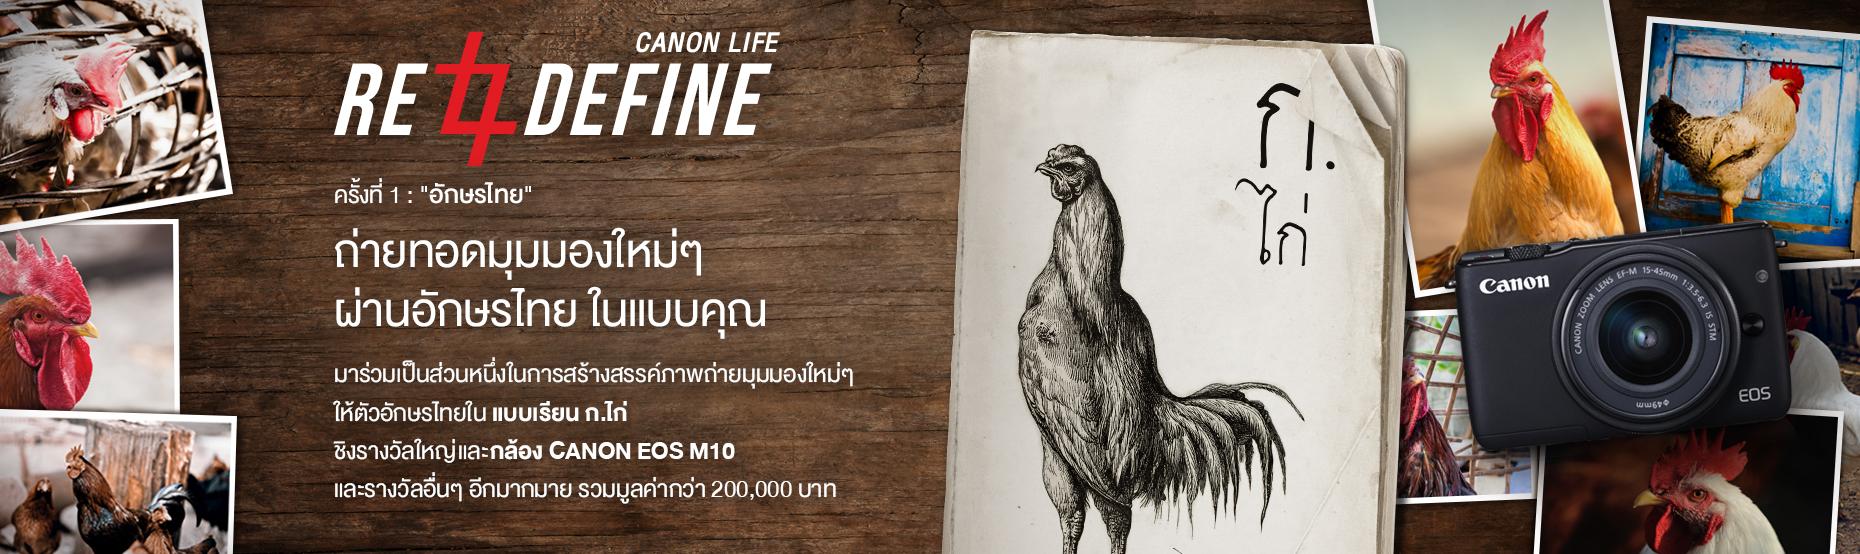 Canon Life Redefine